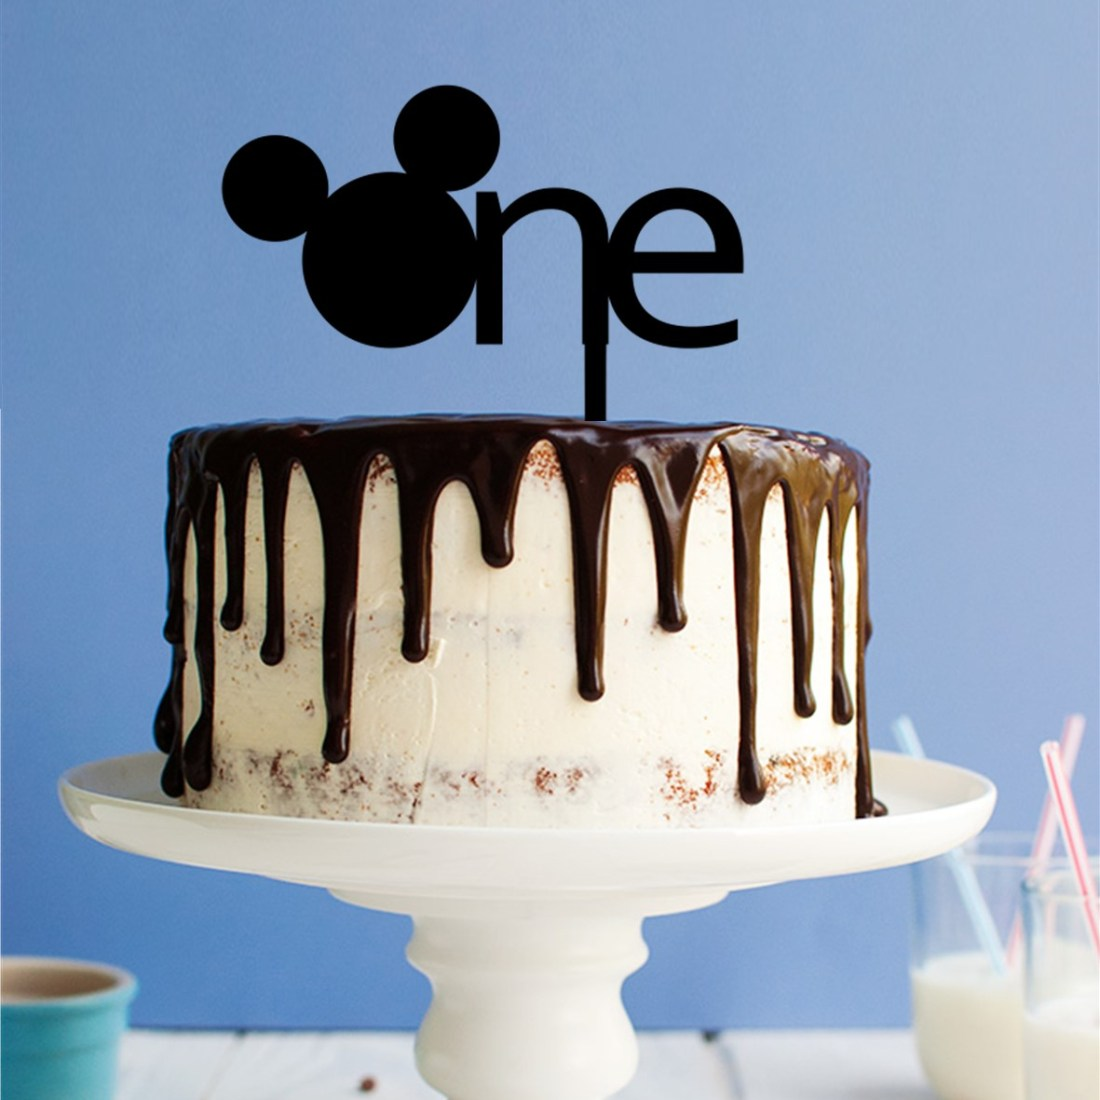 Ears One Cake Topper